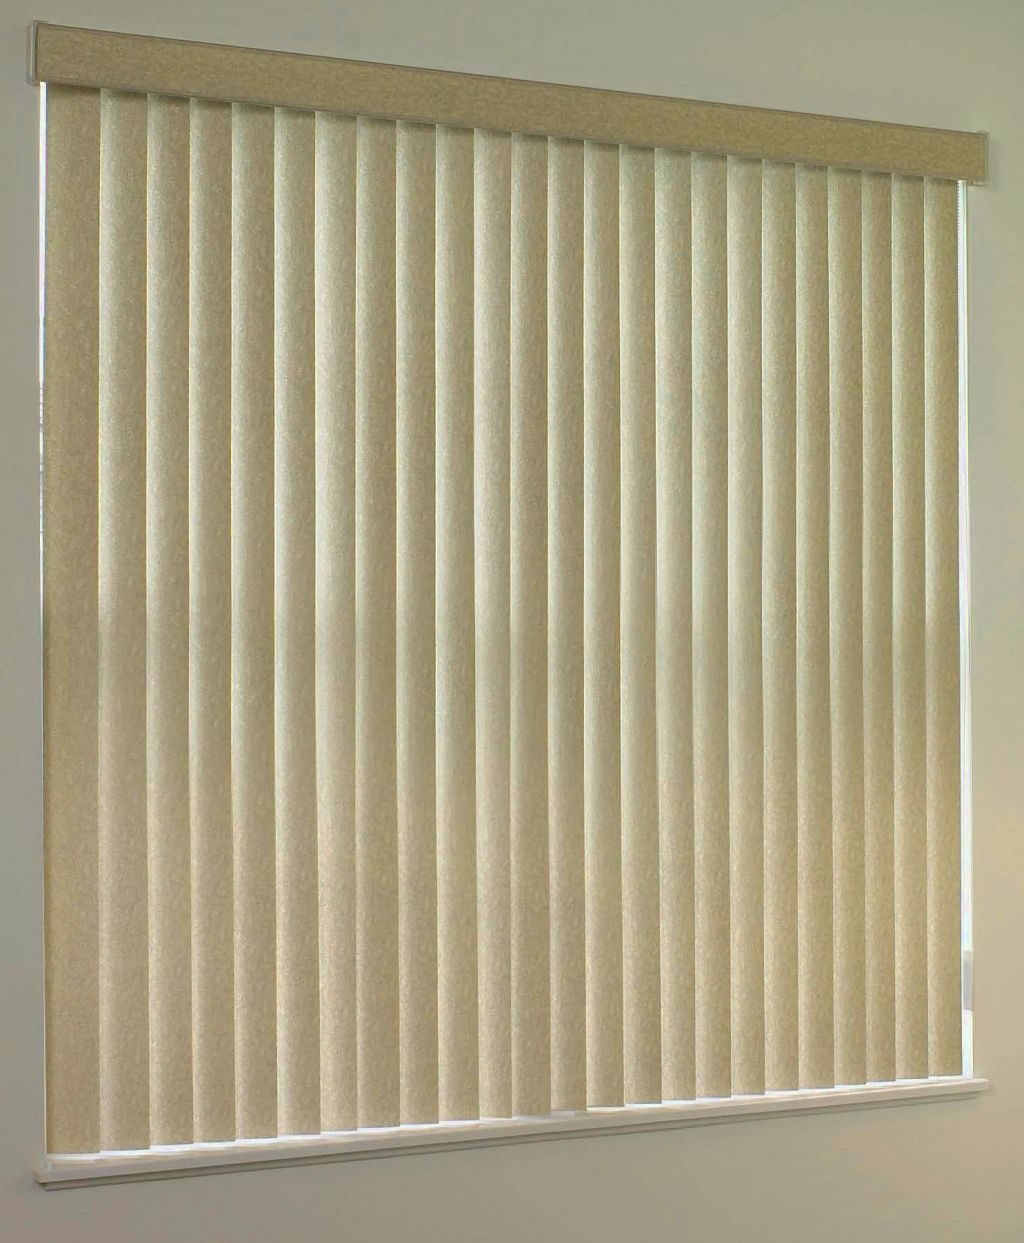 Window blinds ideas  vertical blinds ideas from lowes vertical blinds for windows lowes